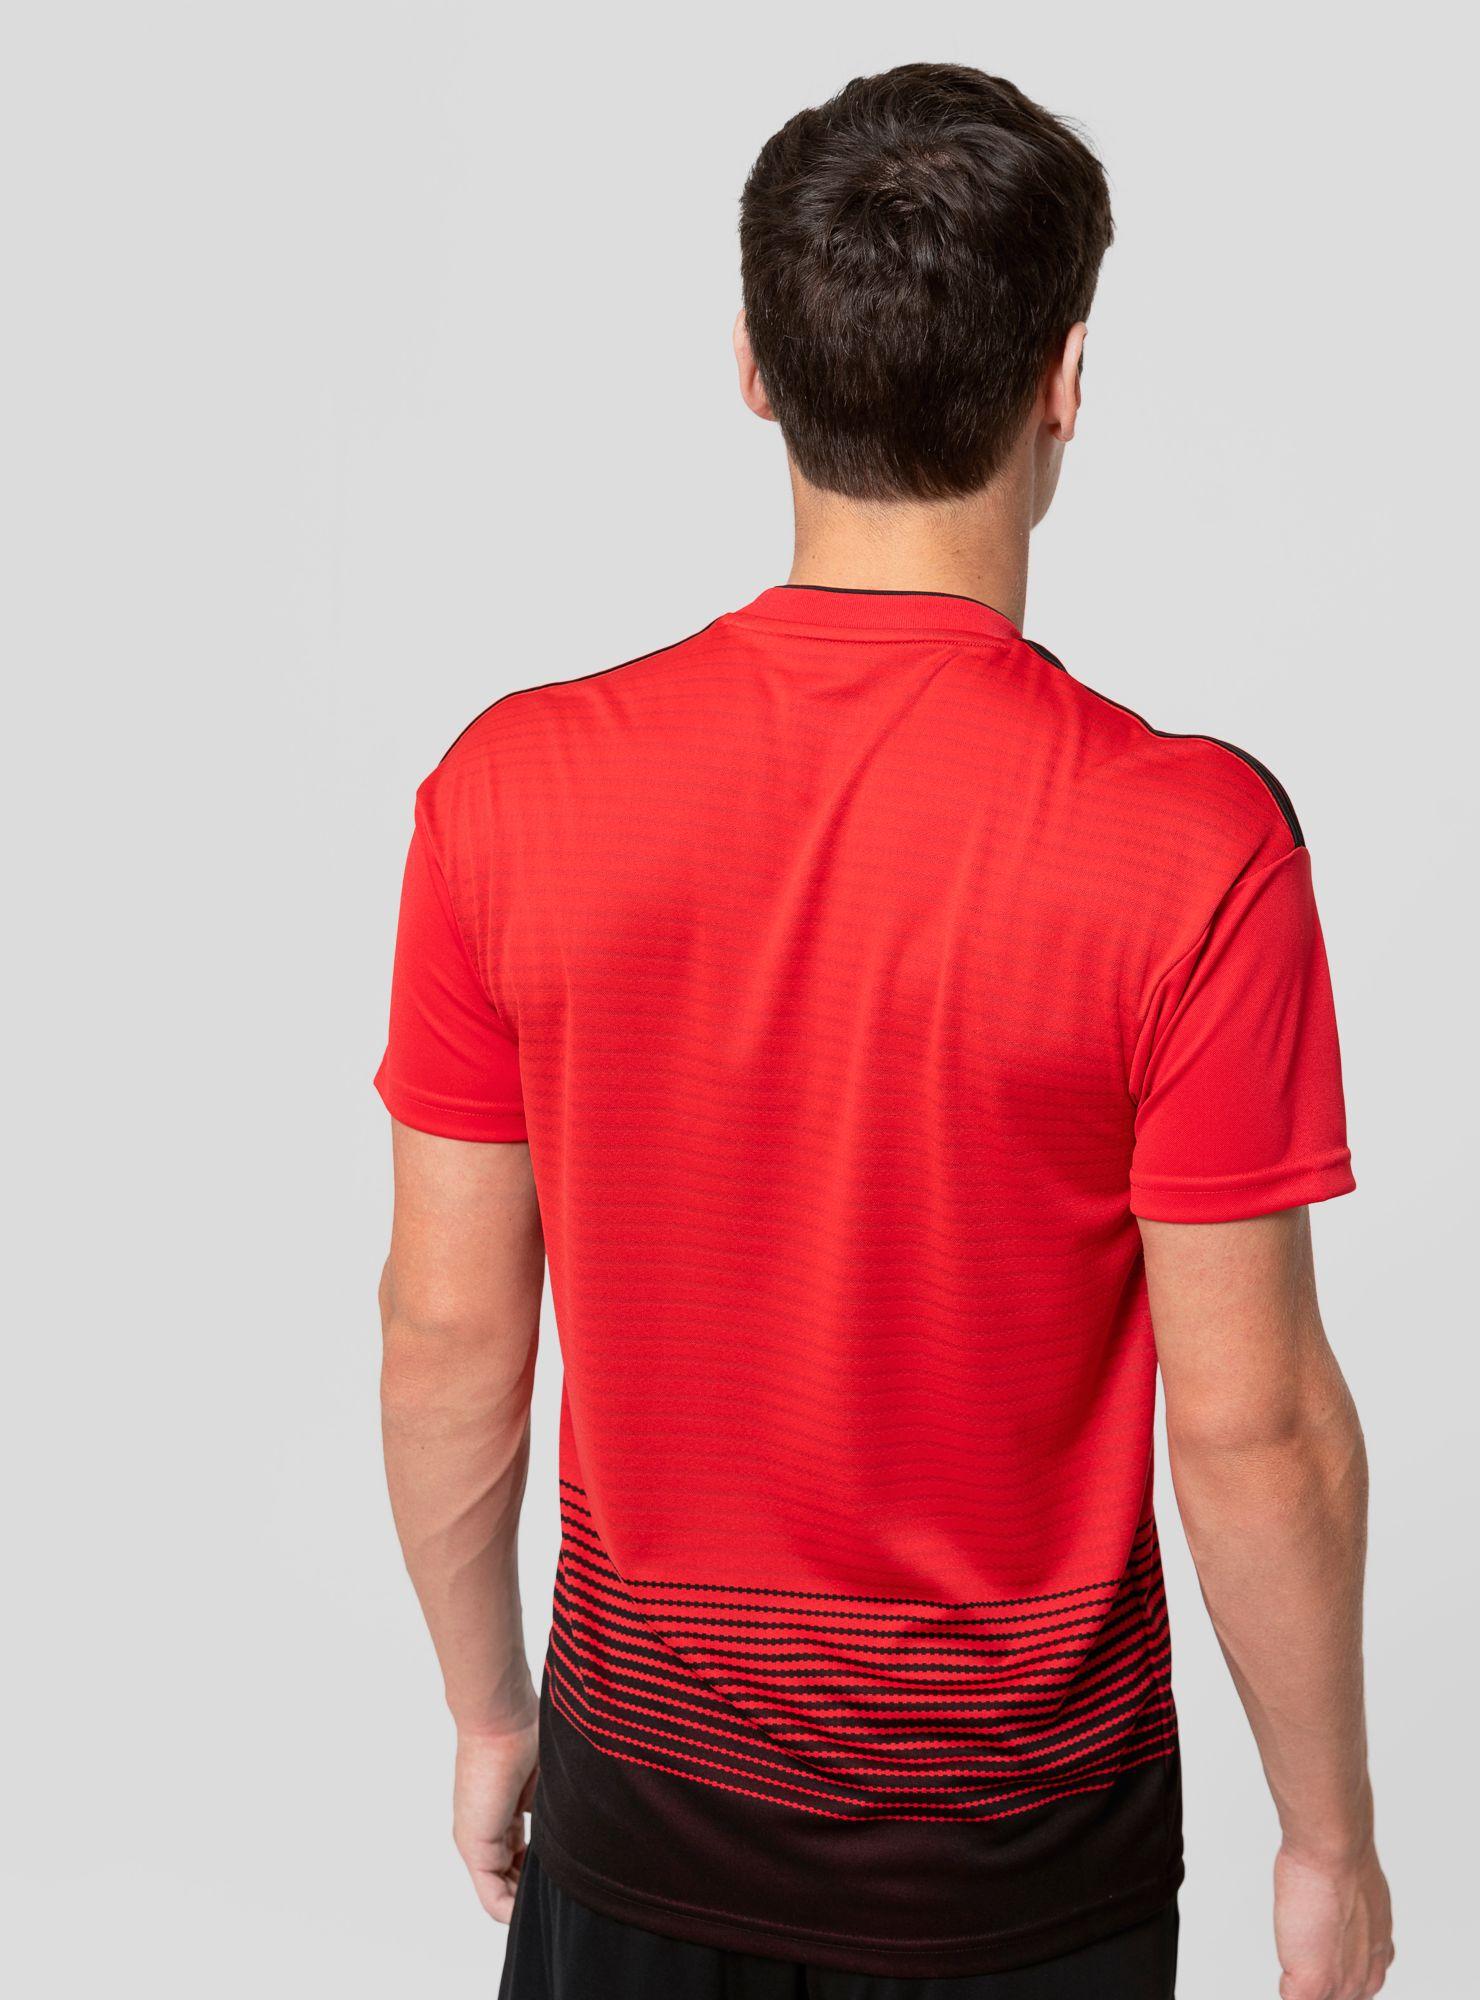 Camiseta de Local Manchester United Réplica Adidas - Camisetas de ... eb1229c14a8b